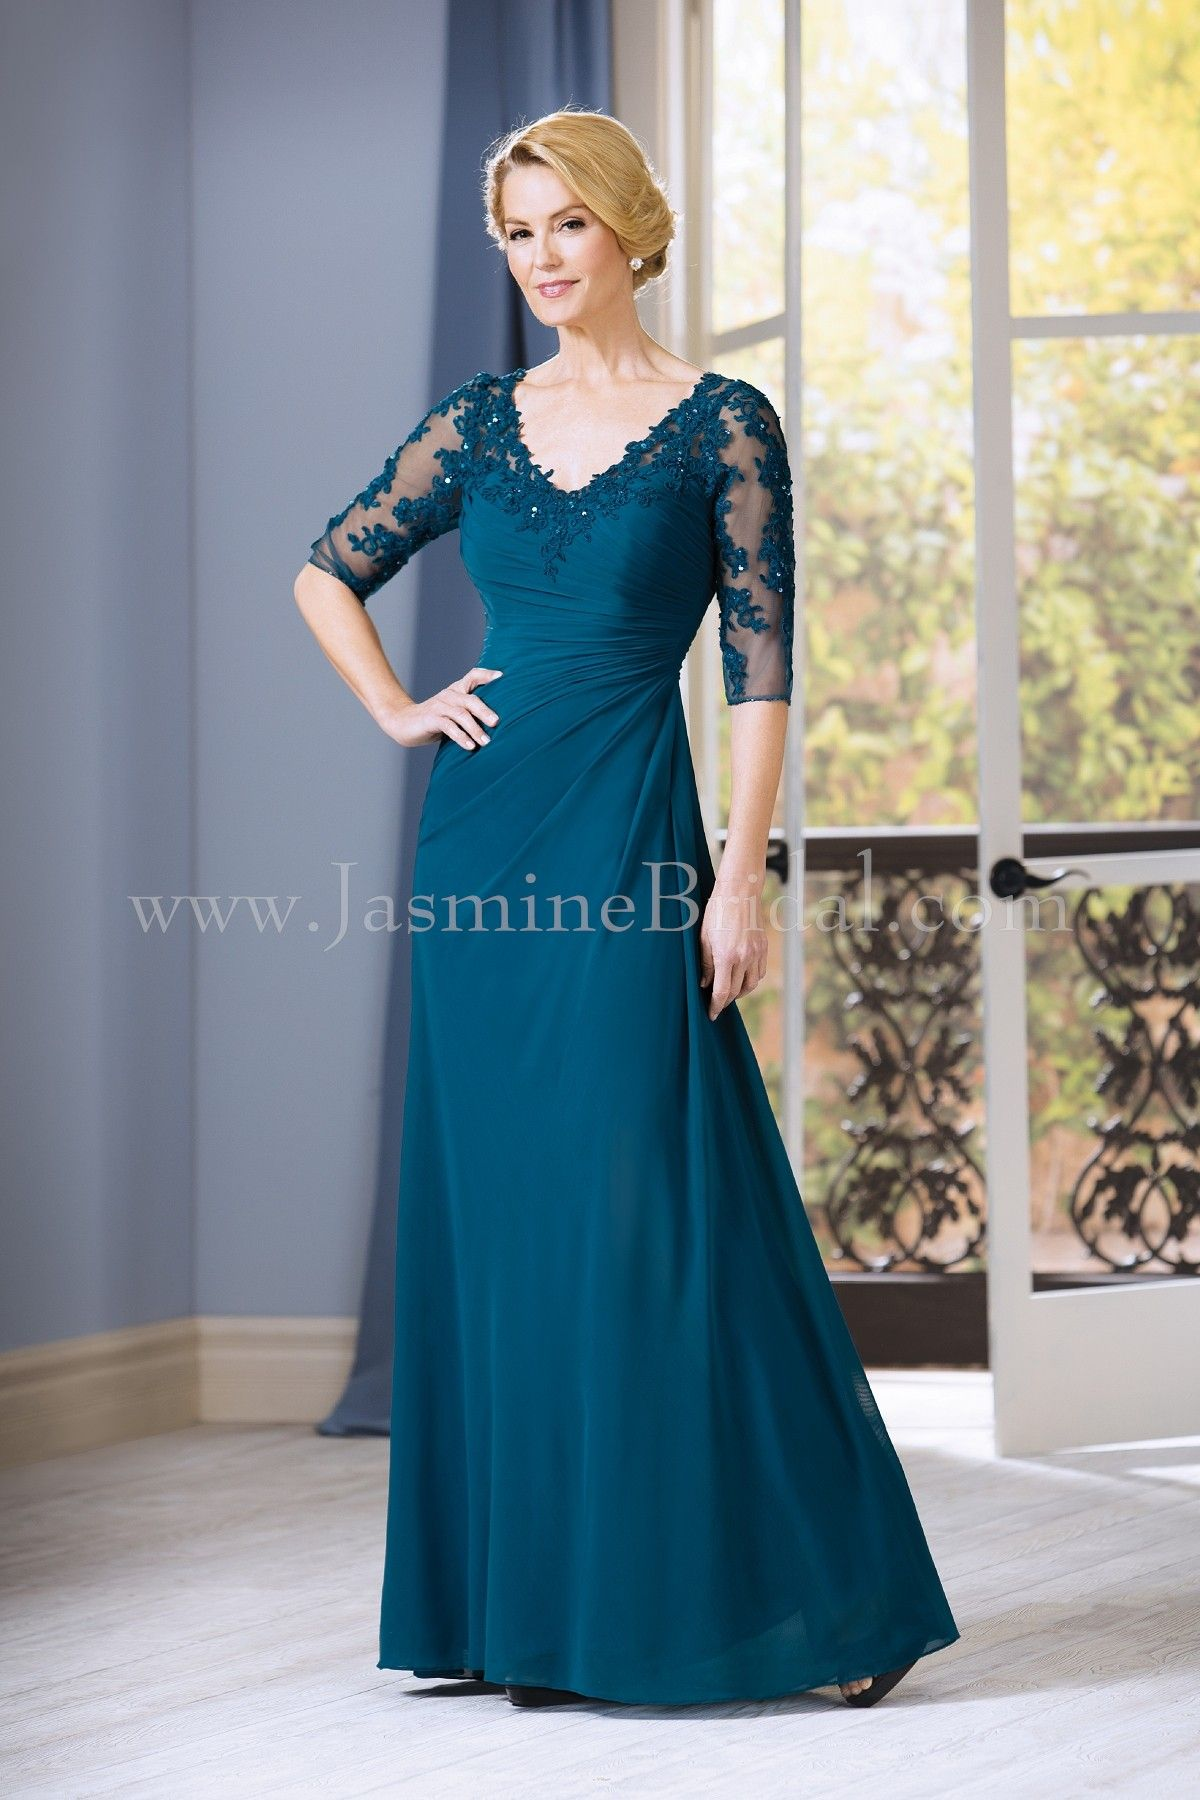 Jasmine Bridal | Mother of the Bride | Pinterest | Jasmine bridal ...